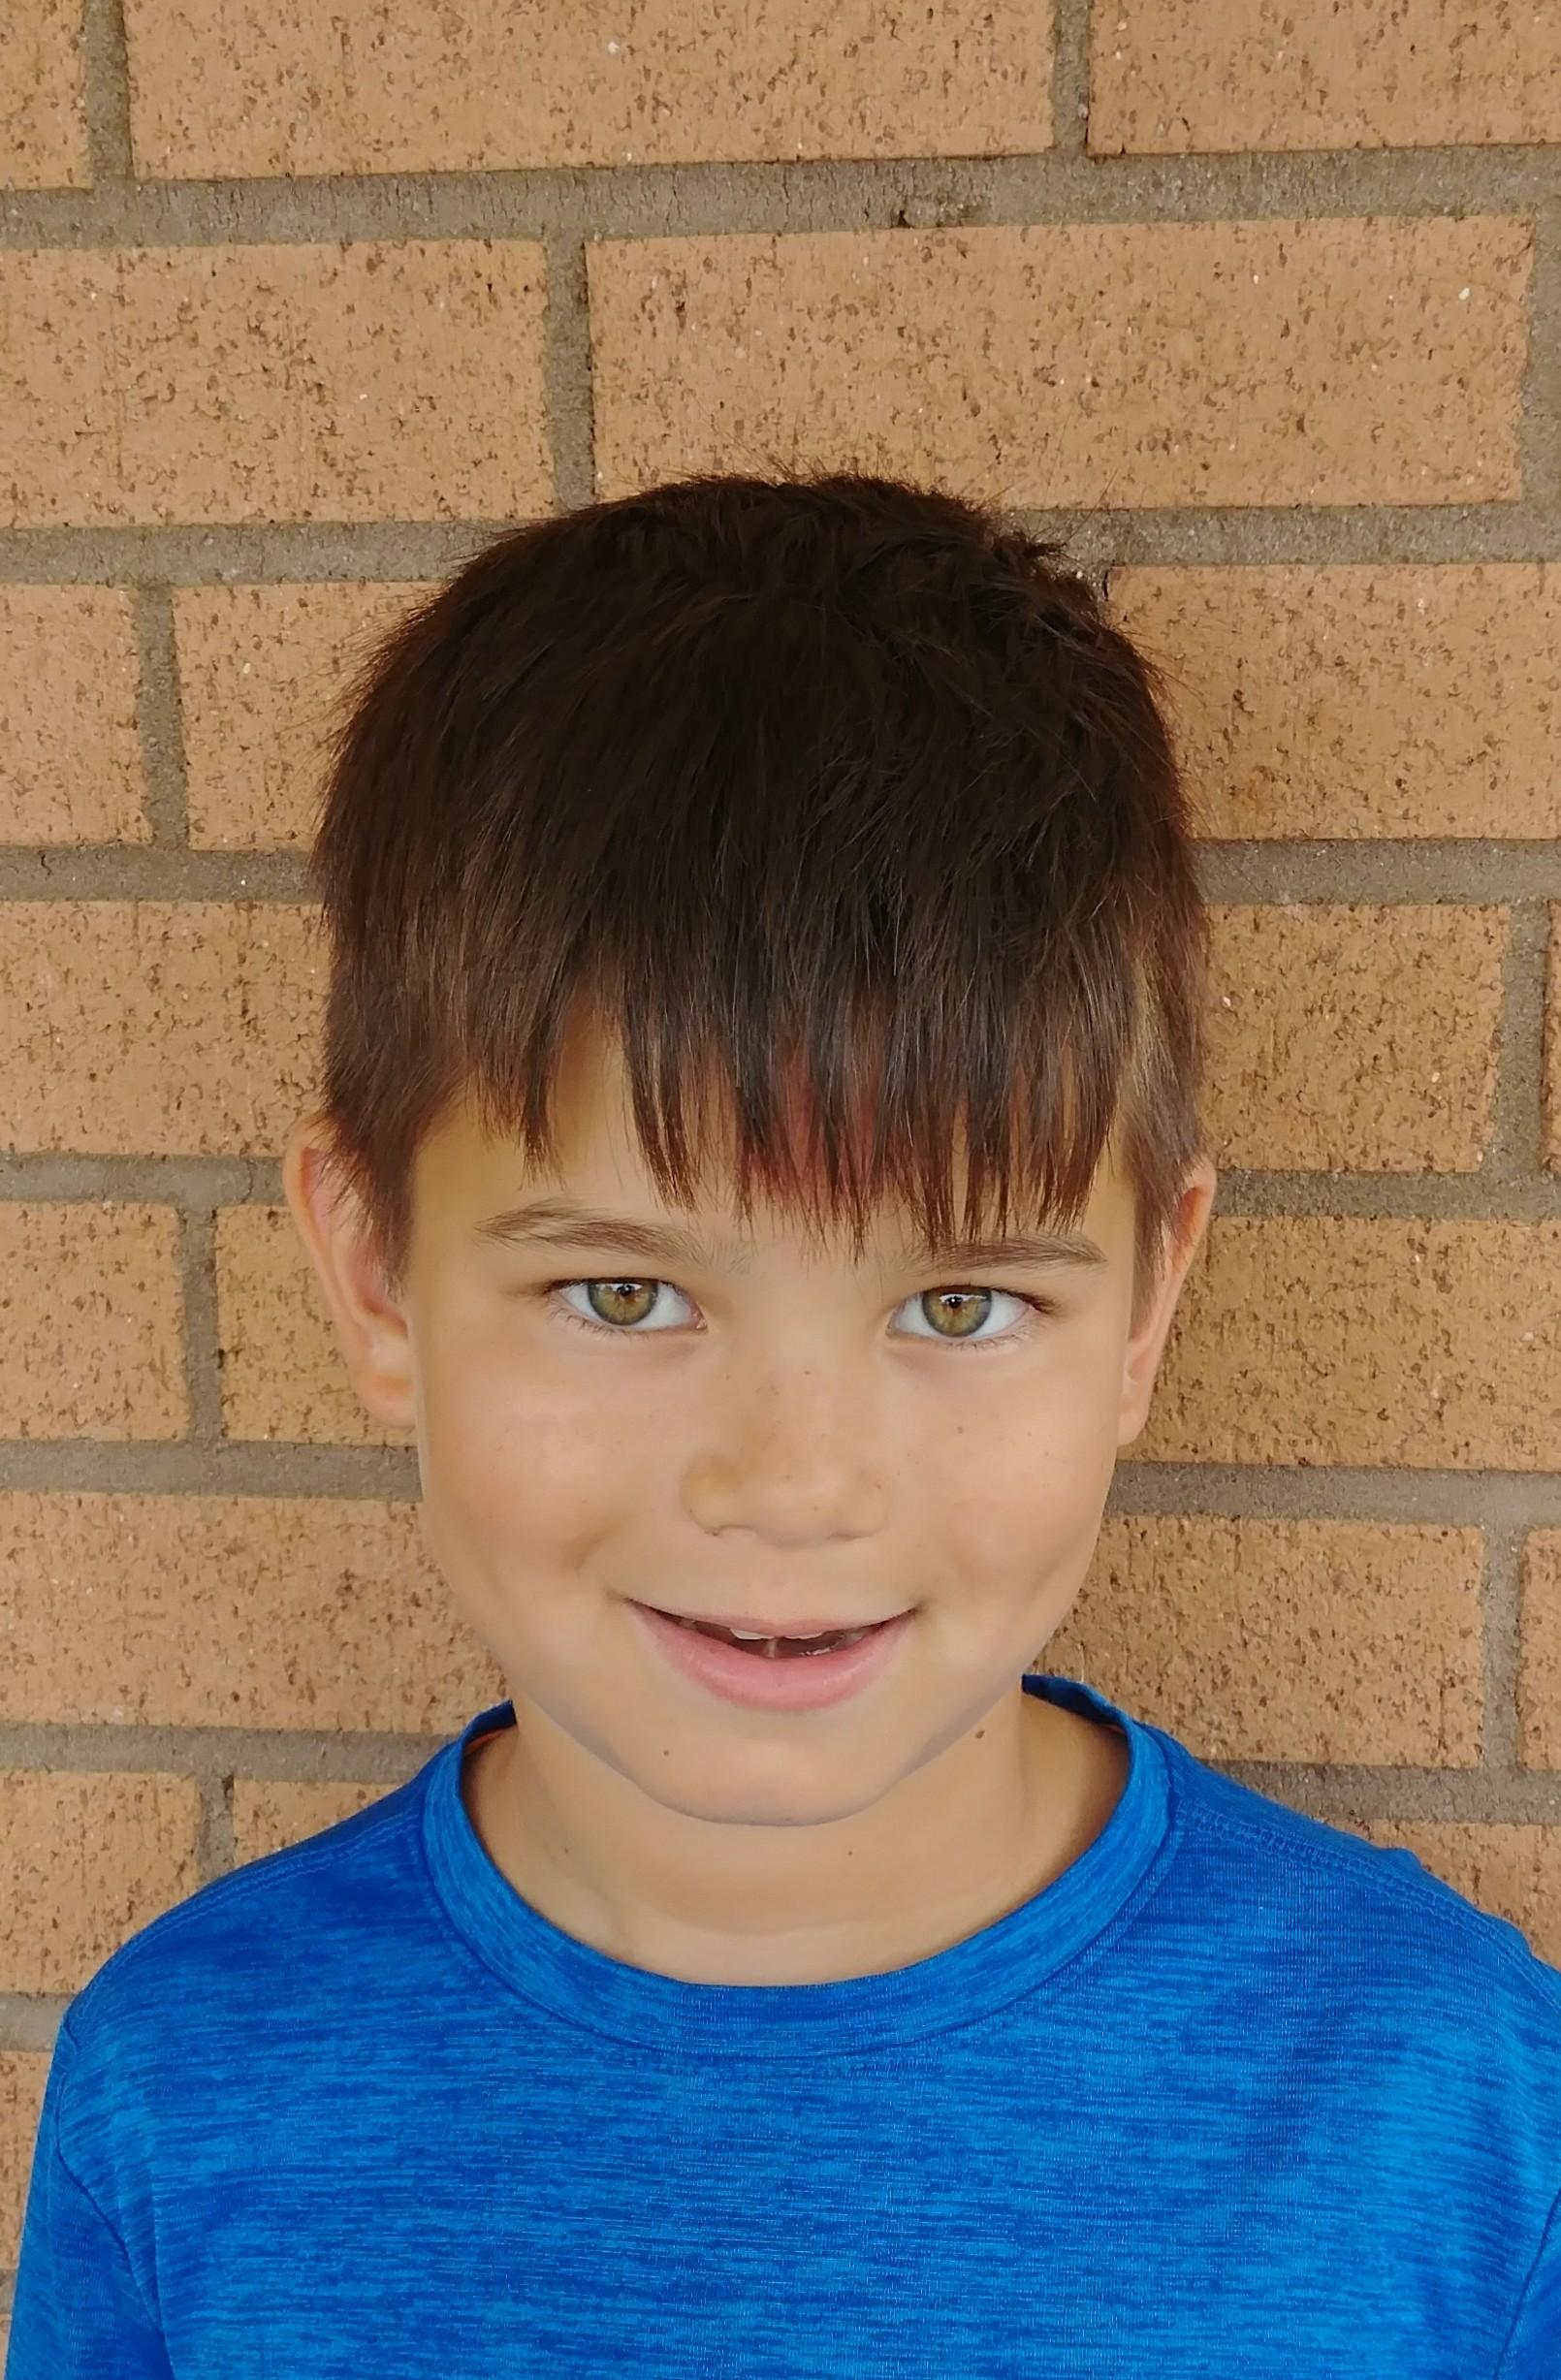 A swimmer because I do the swim team.  Luke  Age 8